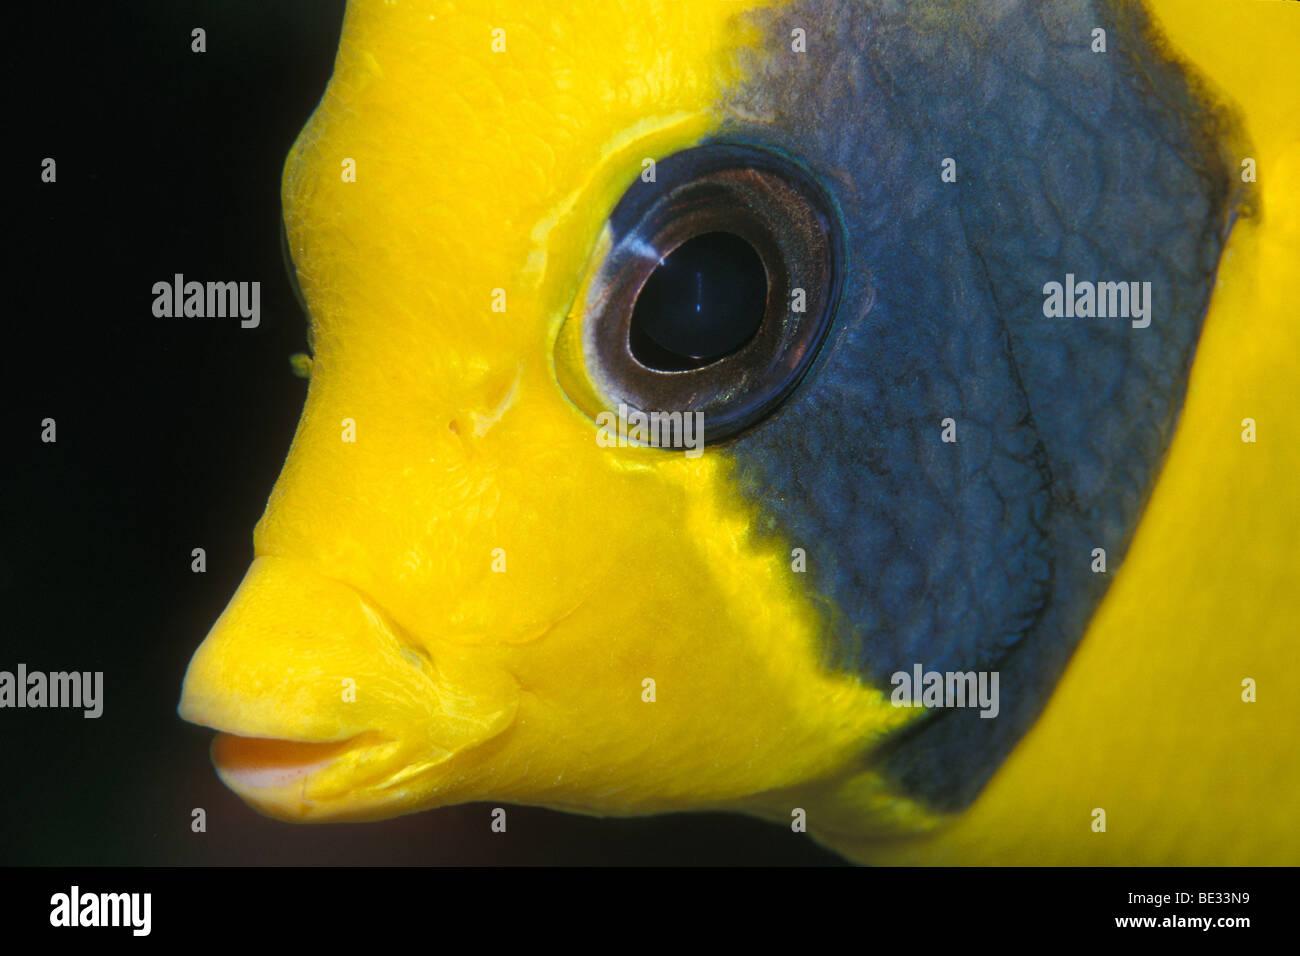 Masked Butterflyfish, Chaetodon semilavatus, Nuweiba, Sinai, Red Sea, Egypt - Stock Image